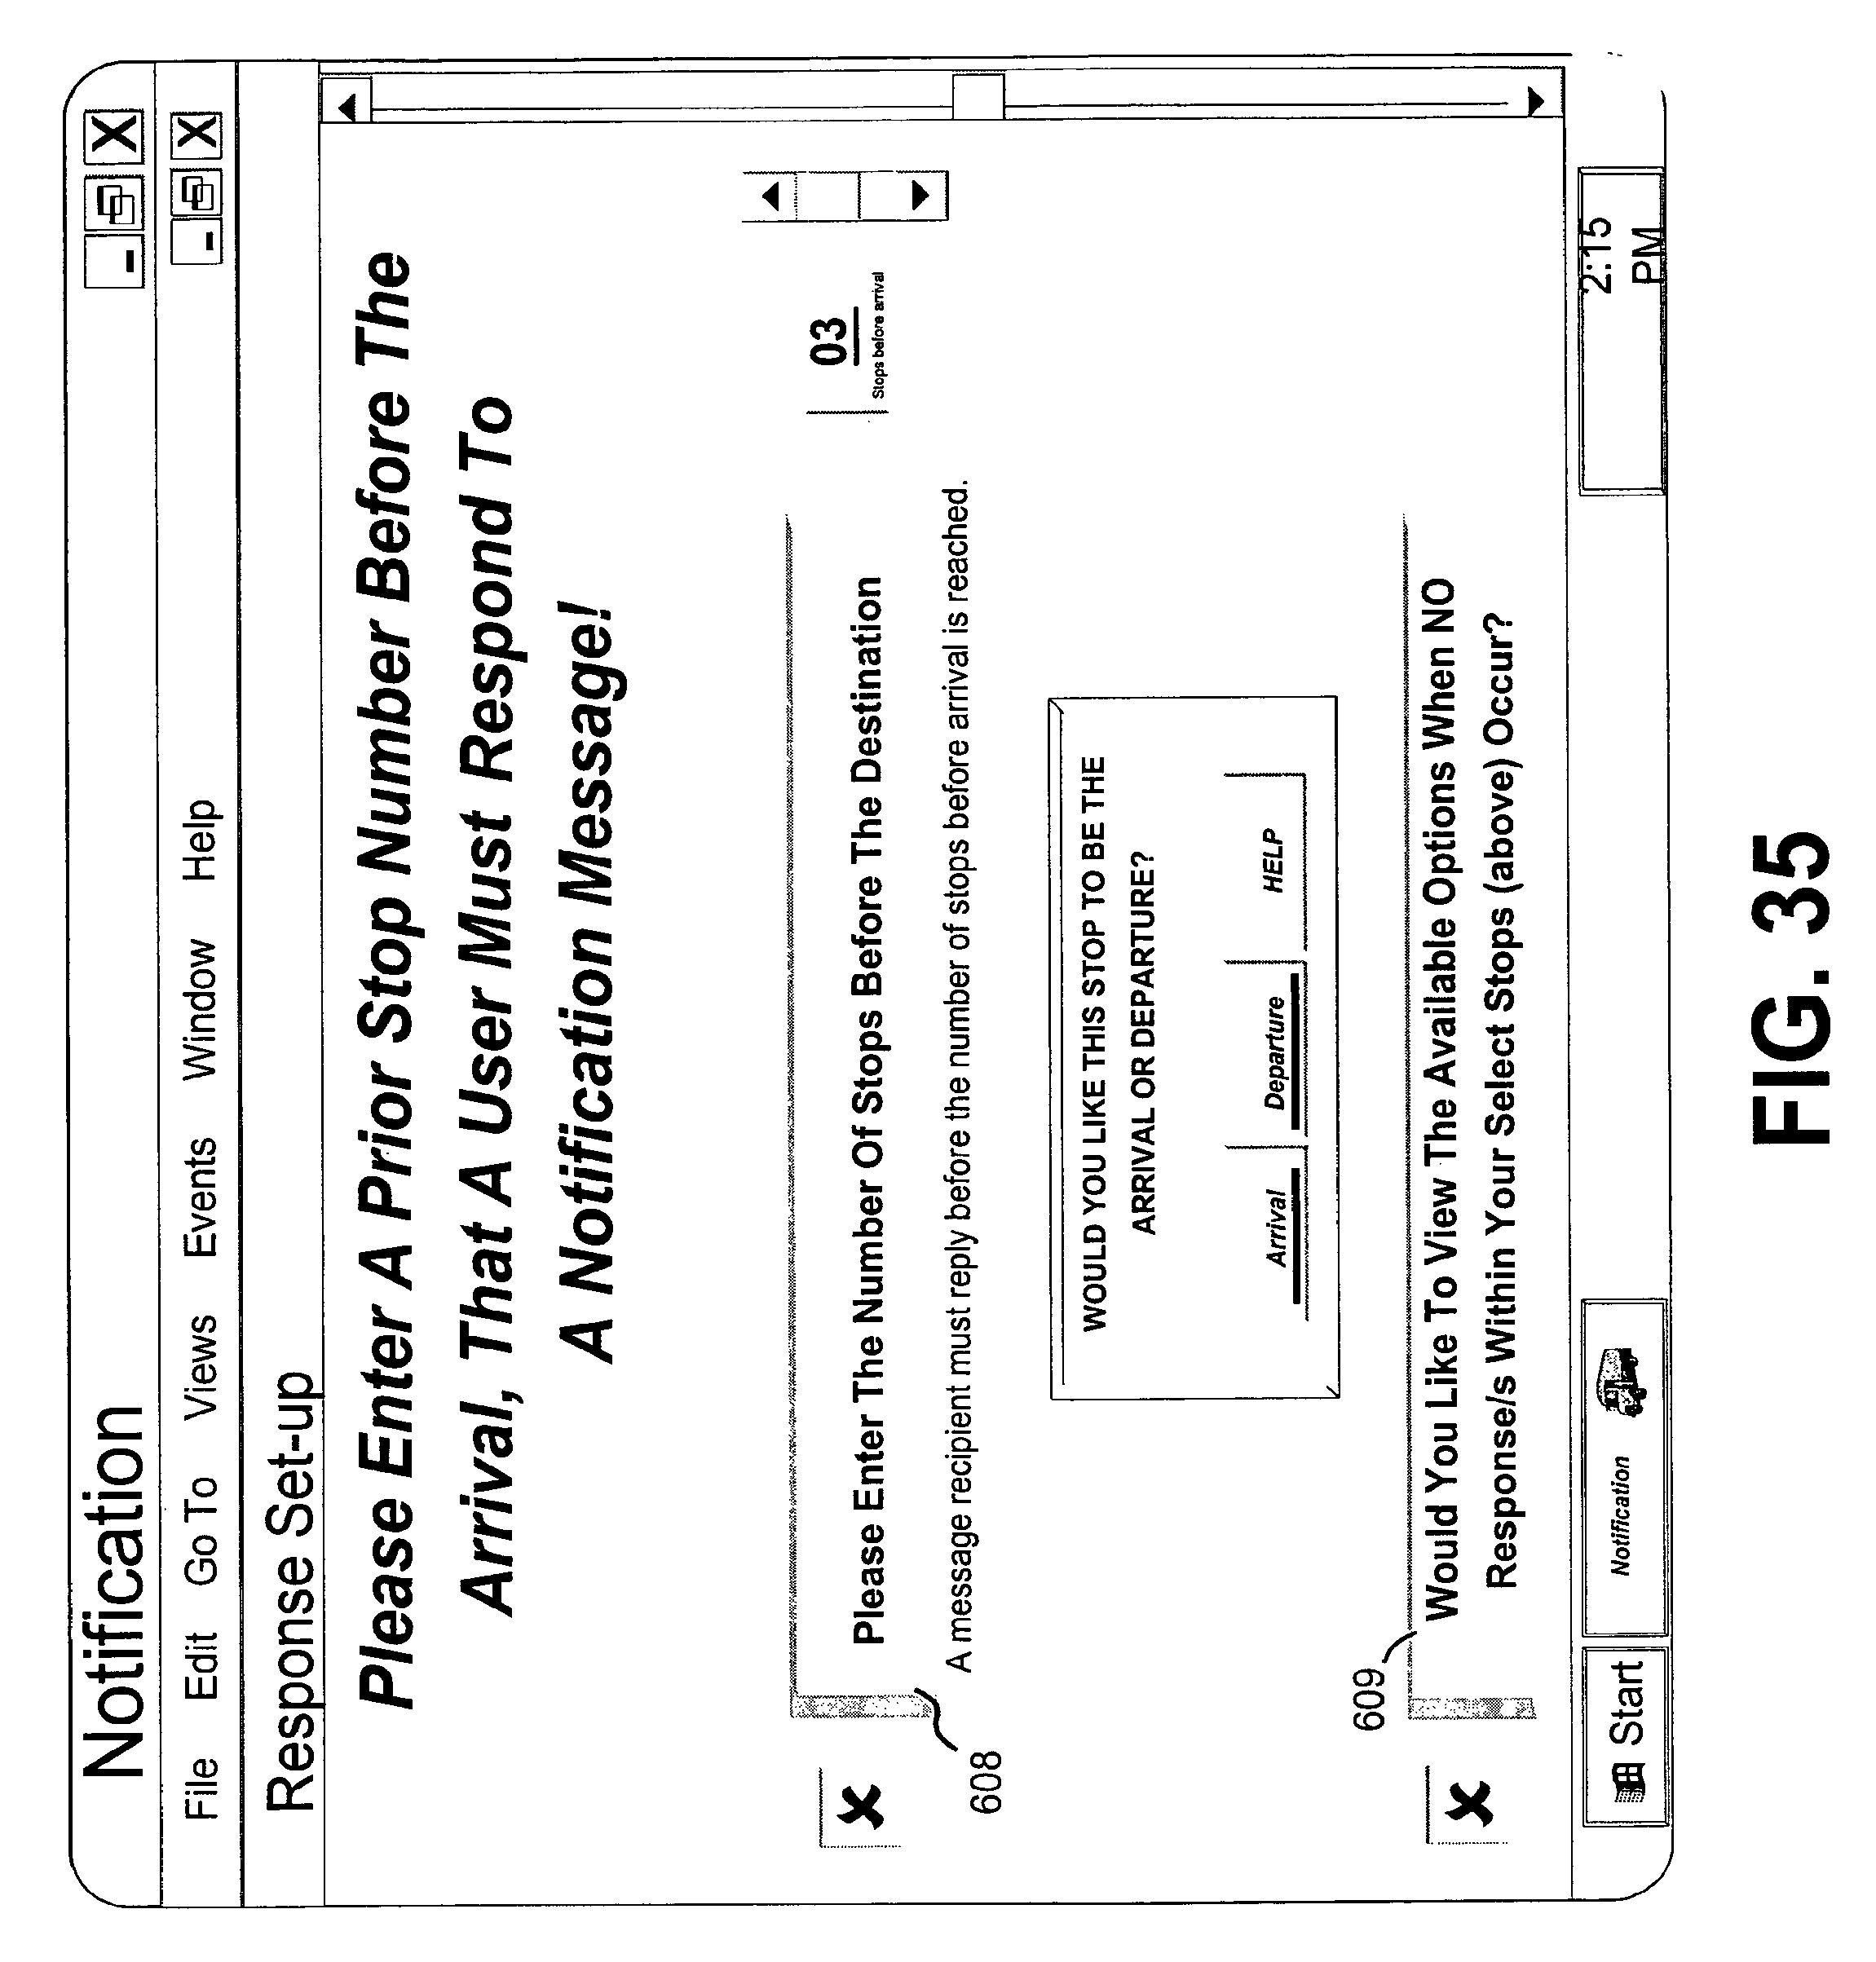 Patent US 8,068,037 B2